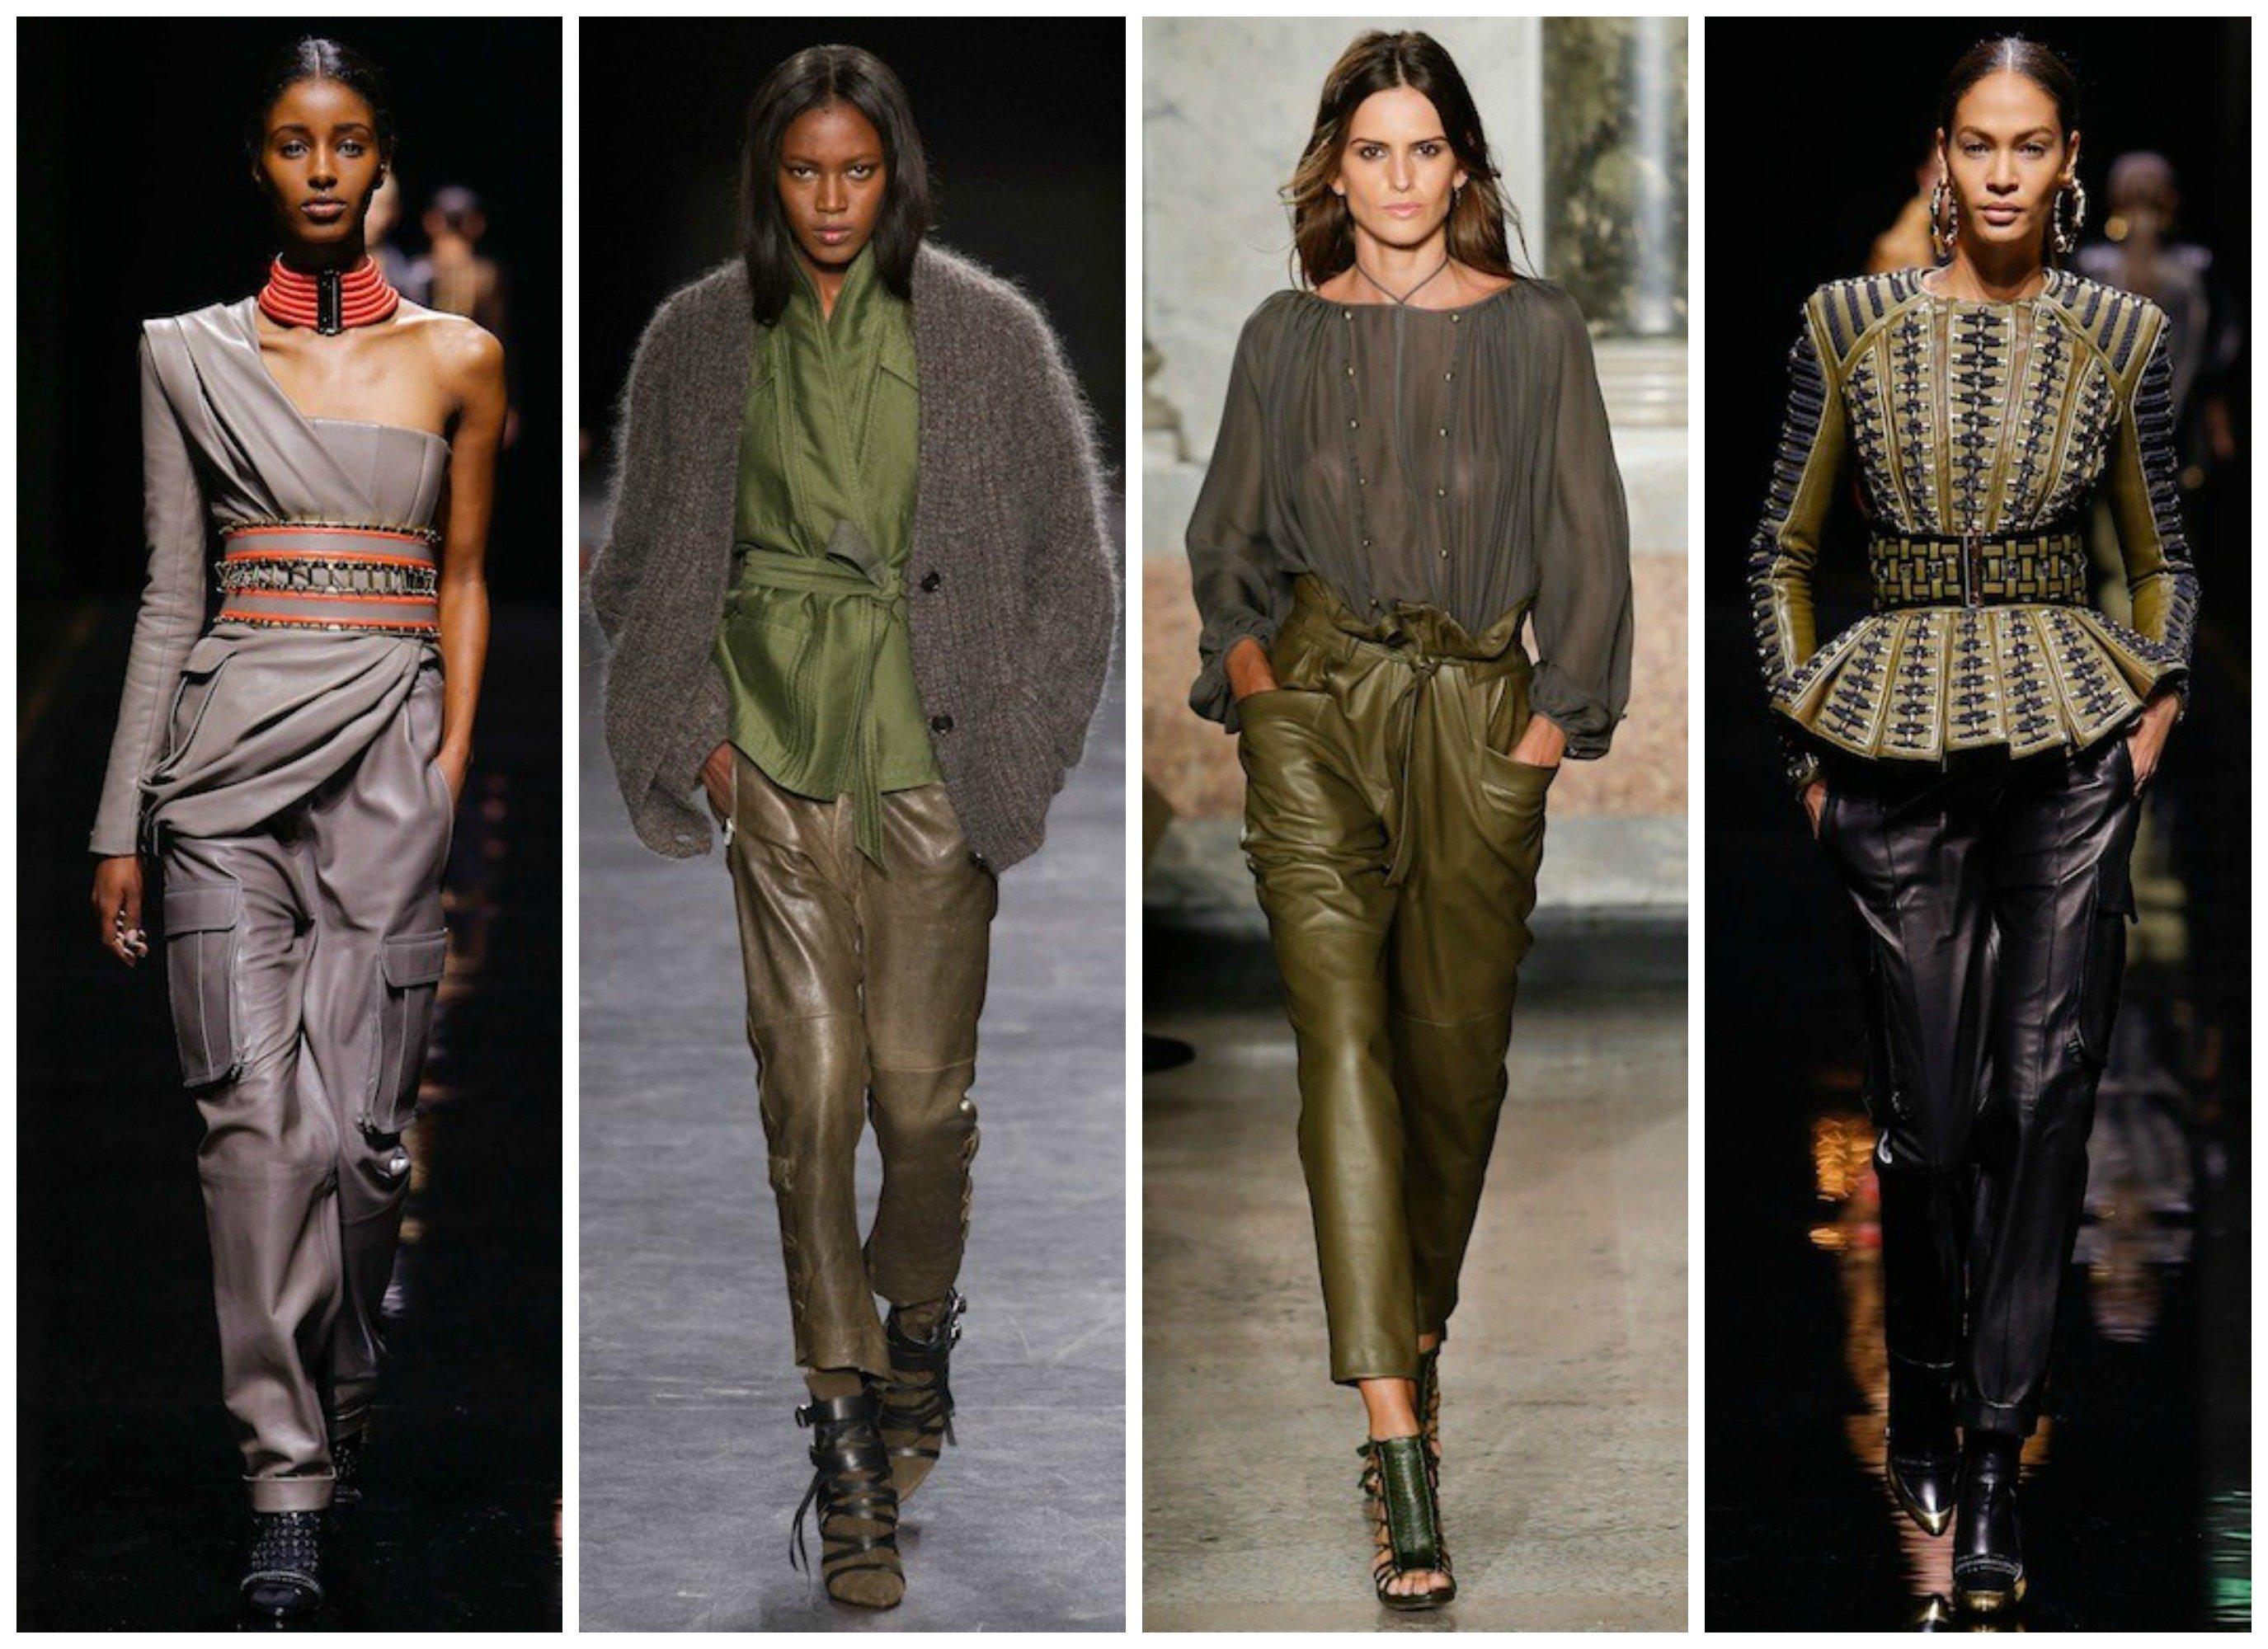 Tassen Mode Herfst 2015 : Stylishweek hier krijg je elke zaterdag een artikel te